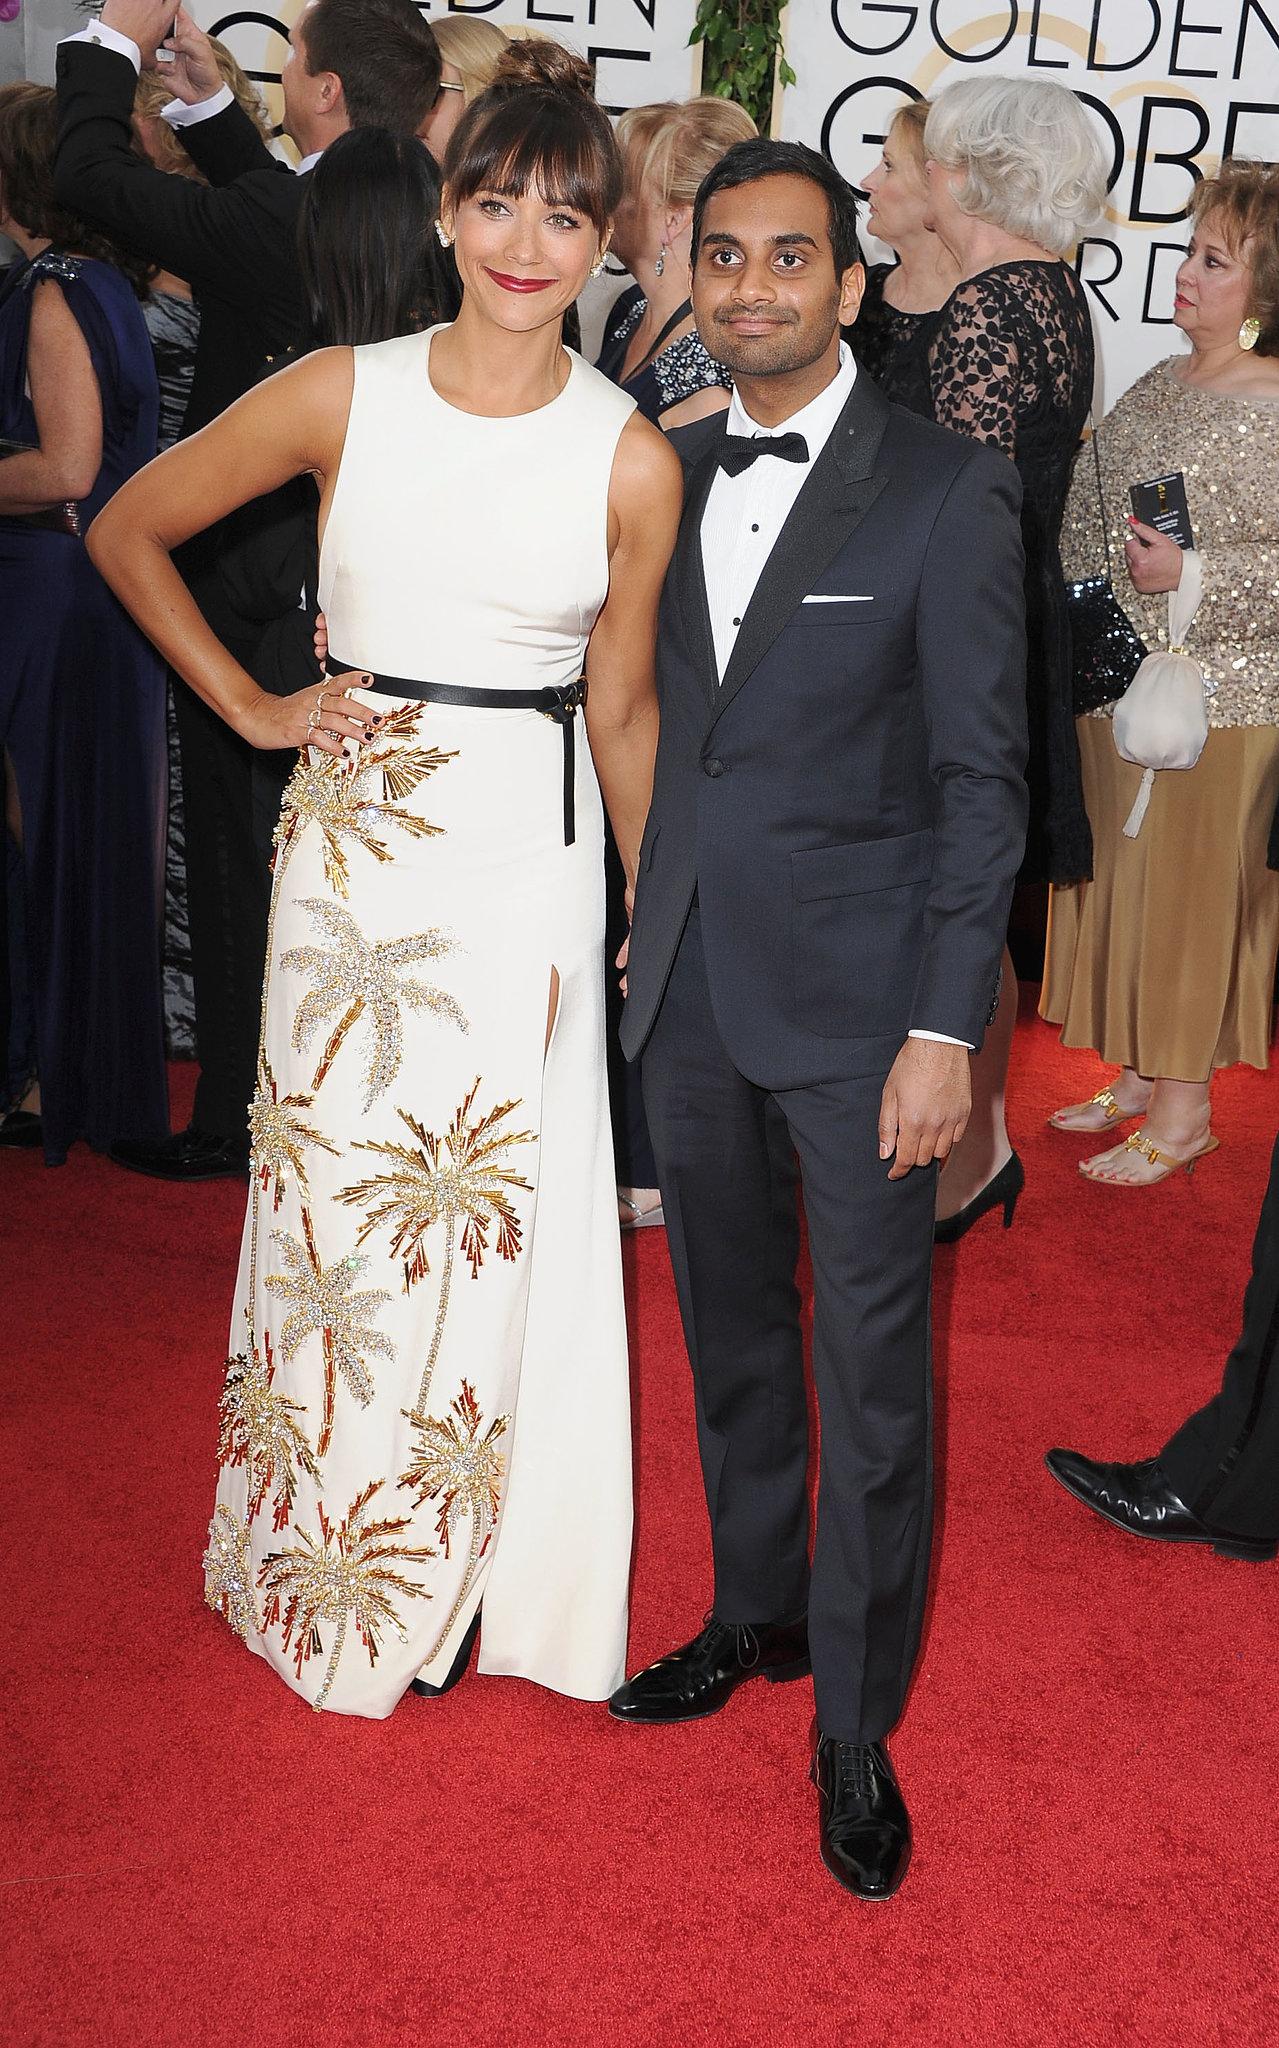 Parks and Recreation stars Rashida Jones and Aziz Ansari posed for photos together